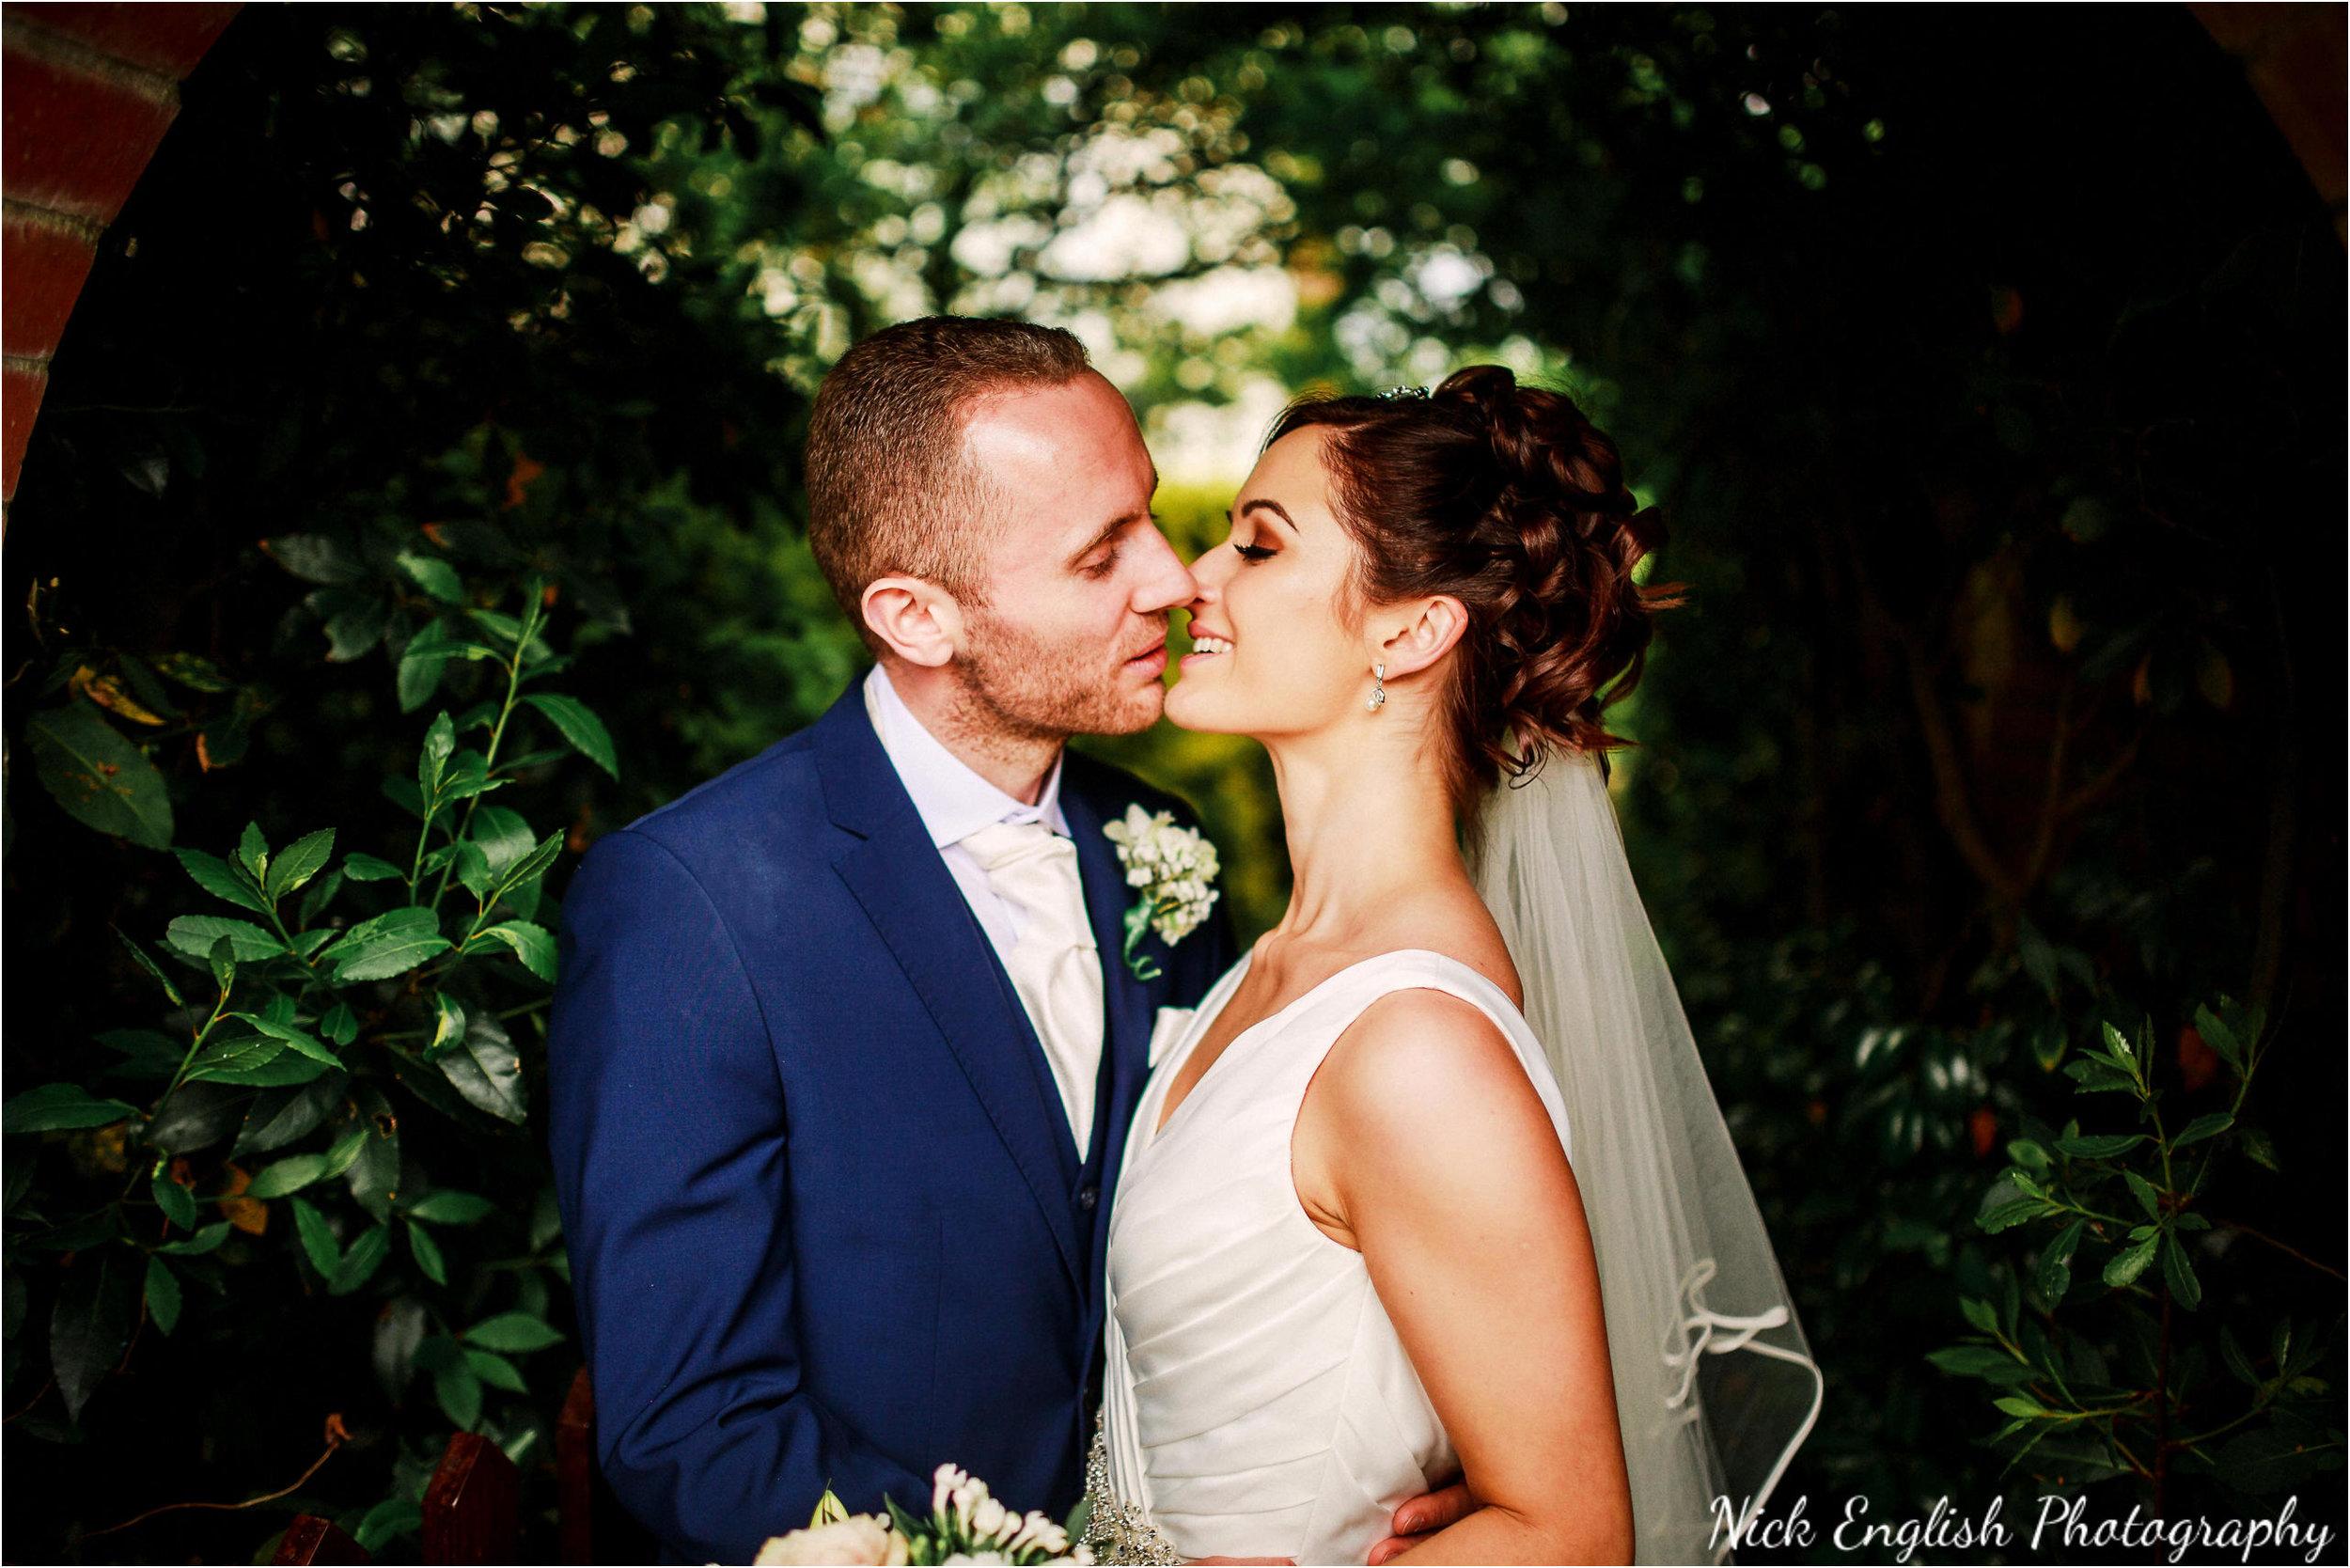 Emily David Wedding Photographs at Barton Grange Preston by Nick English Photography 149jpg.jpeg